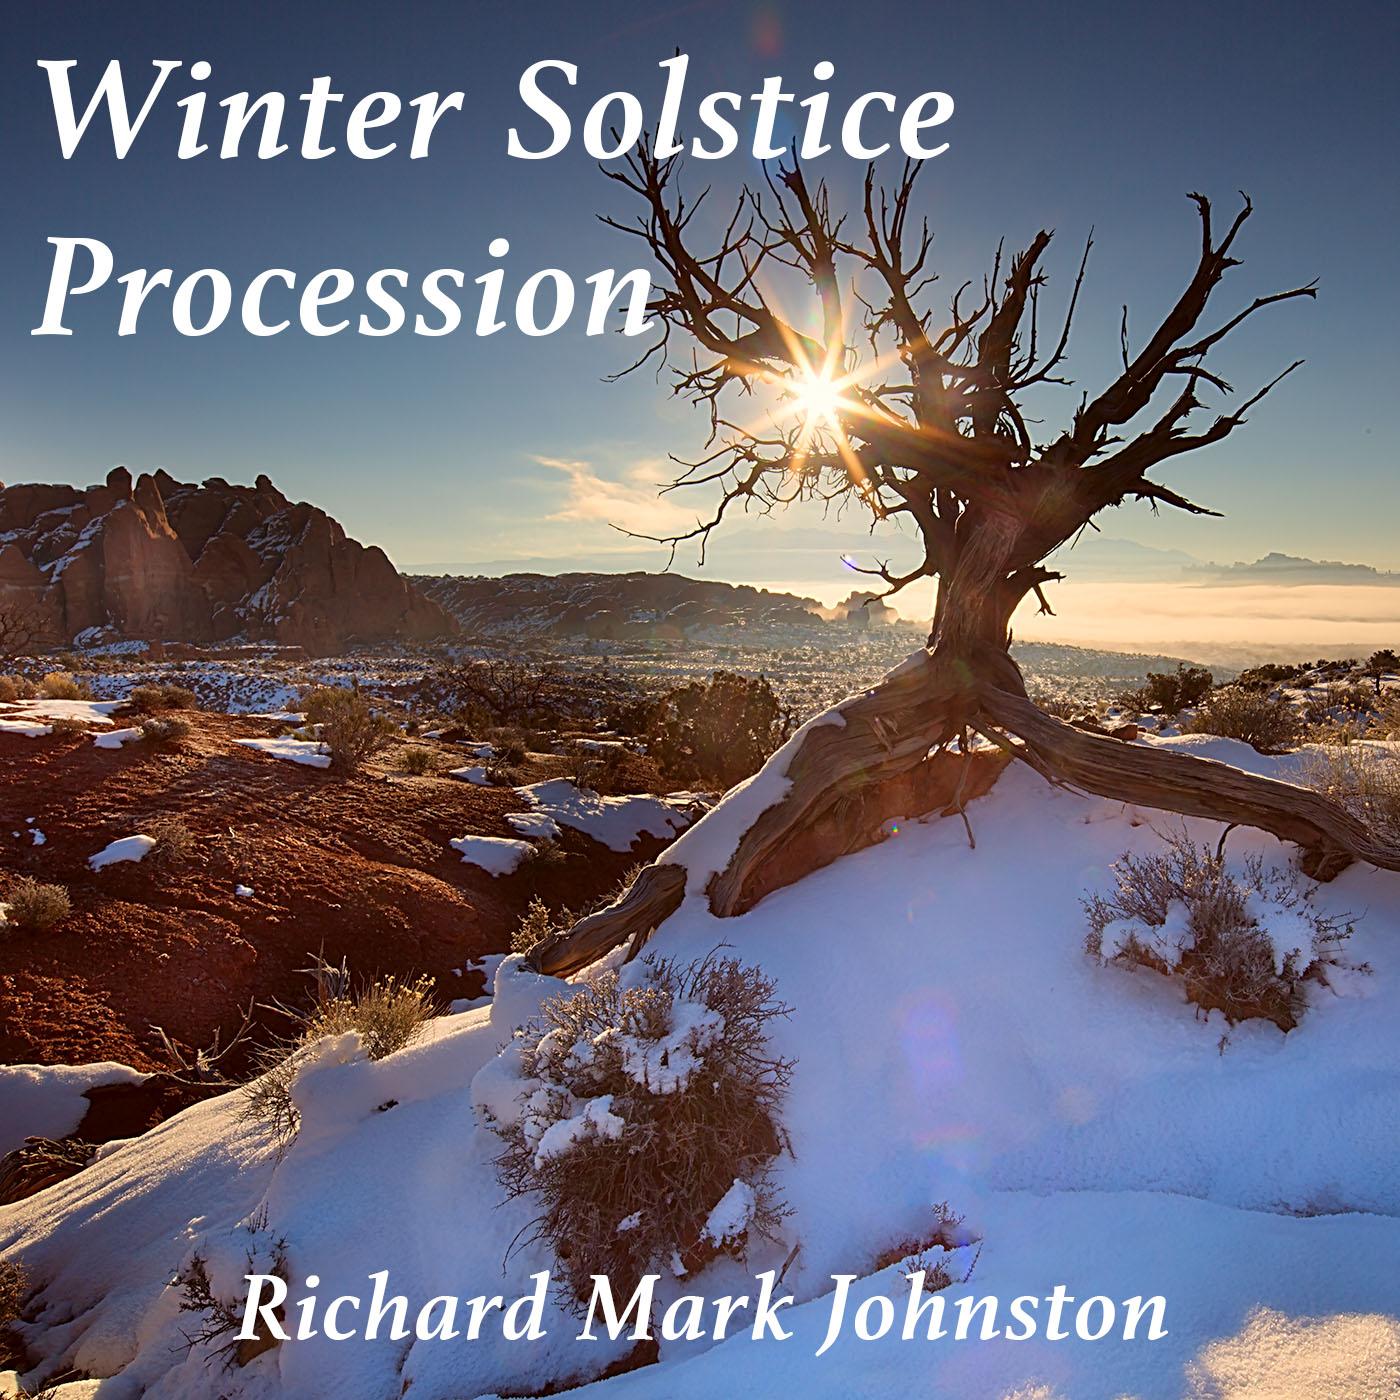 Winter Solstice Procession - 1352-_C9A-6973-6973-6975.jpg